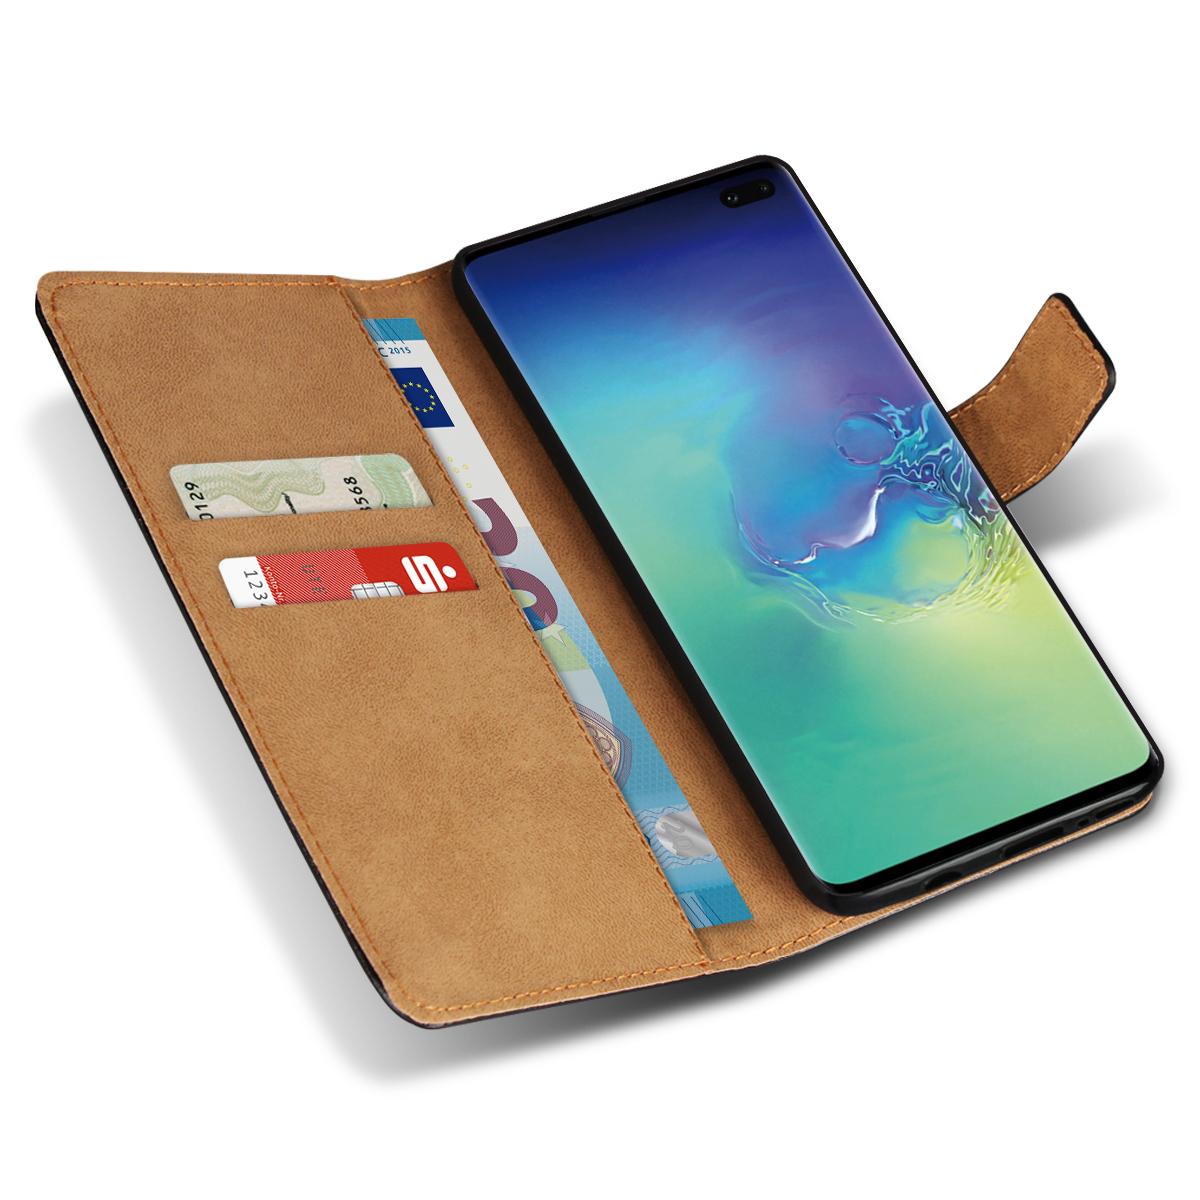 2f99fdc8ac4ab Leder Hülle Samsung Galaxy S10 Plus Tasche Schutzhülle Cover Book Case  Schwarz